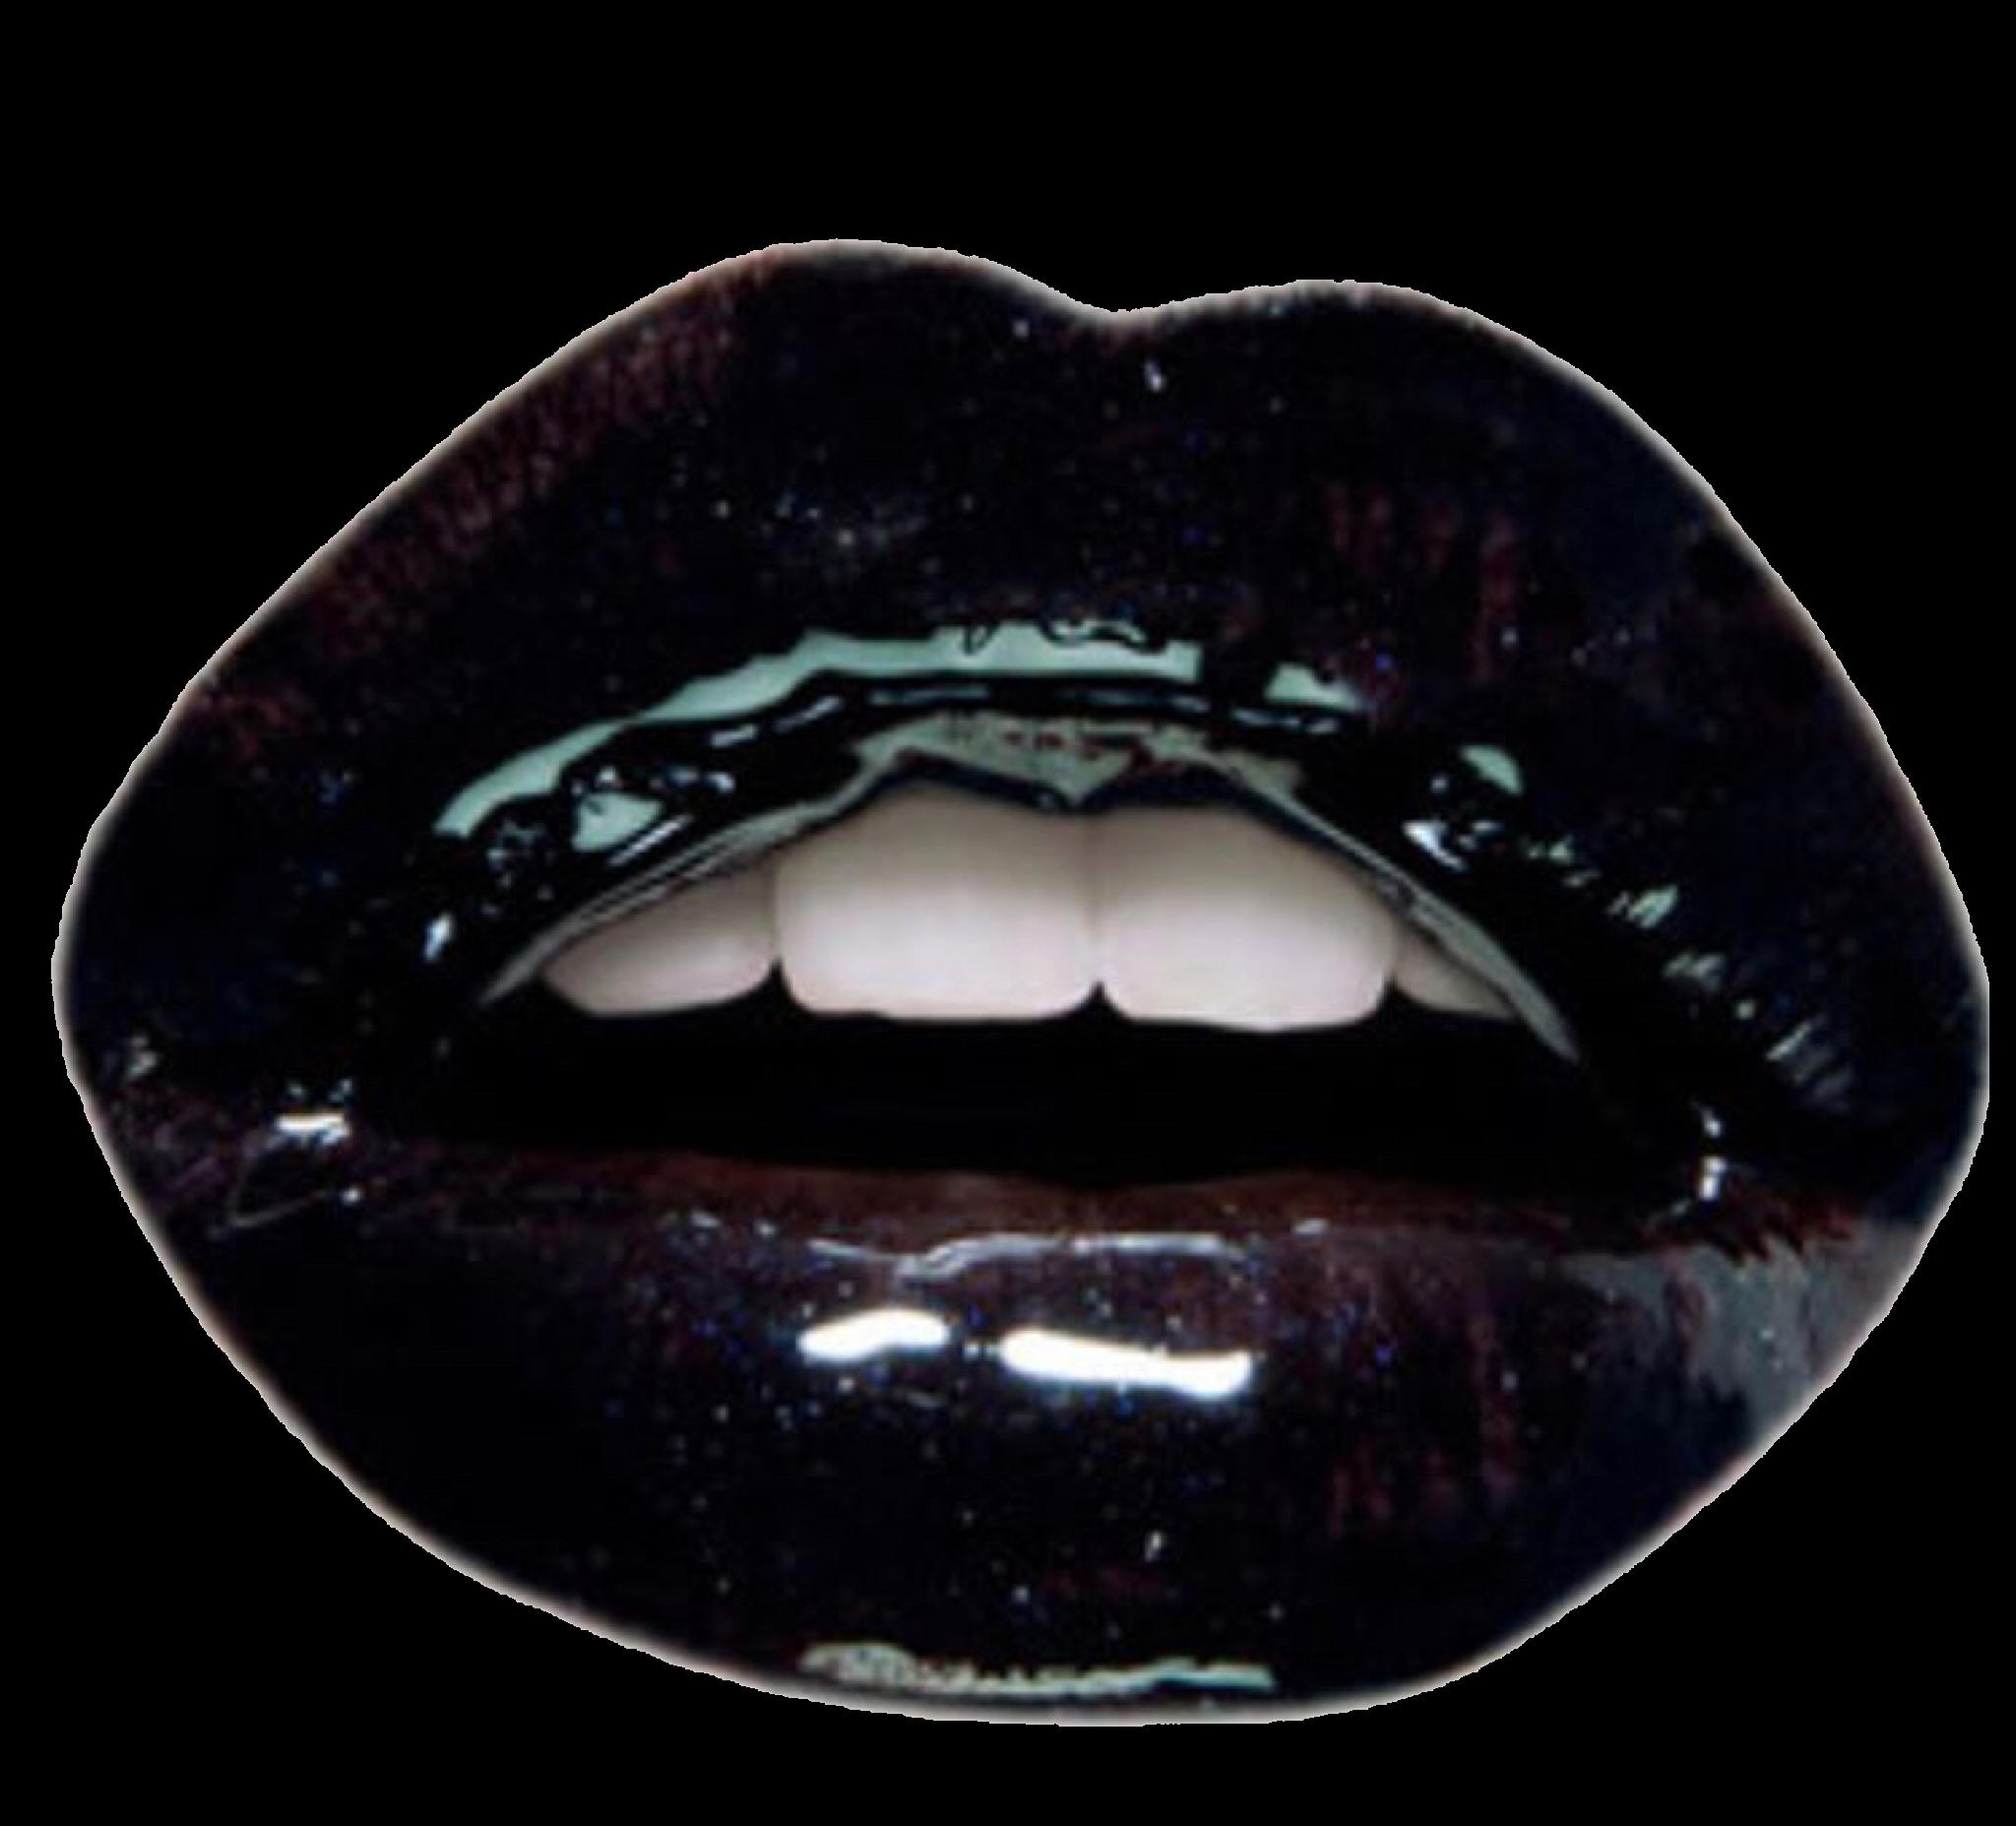 Pin By Daisyqueenofflowers On Pngs Black Lips Mood Boards Lips